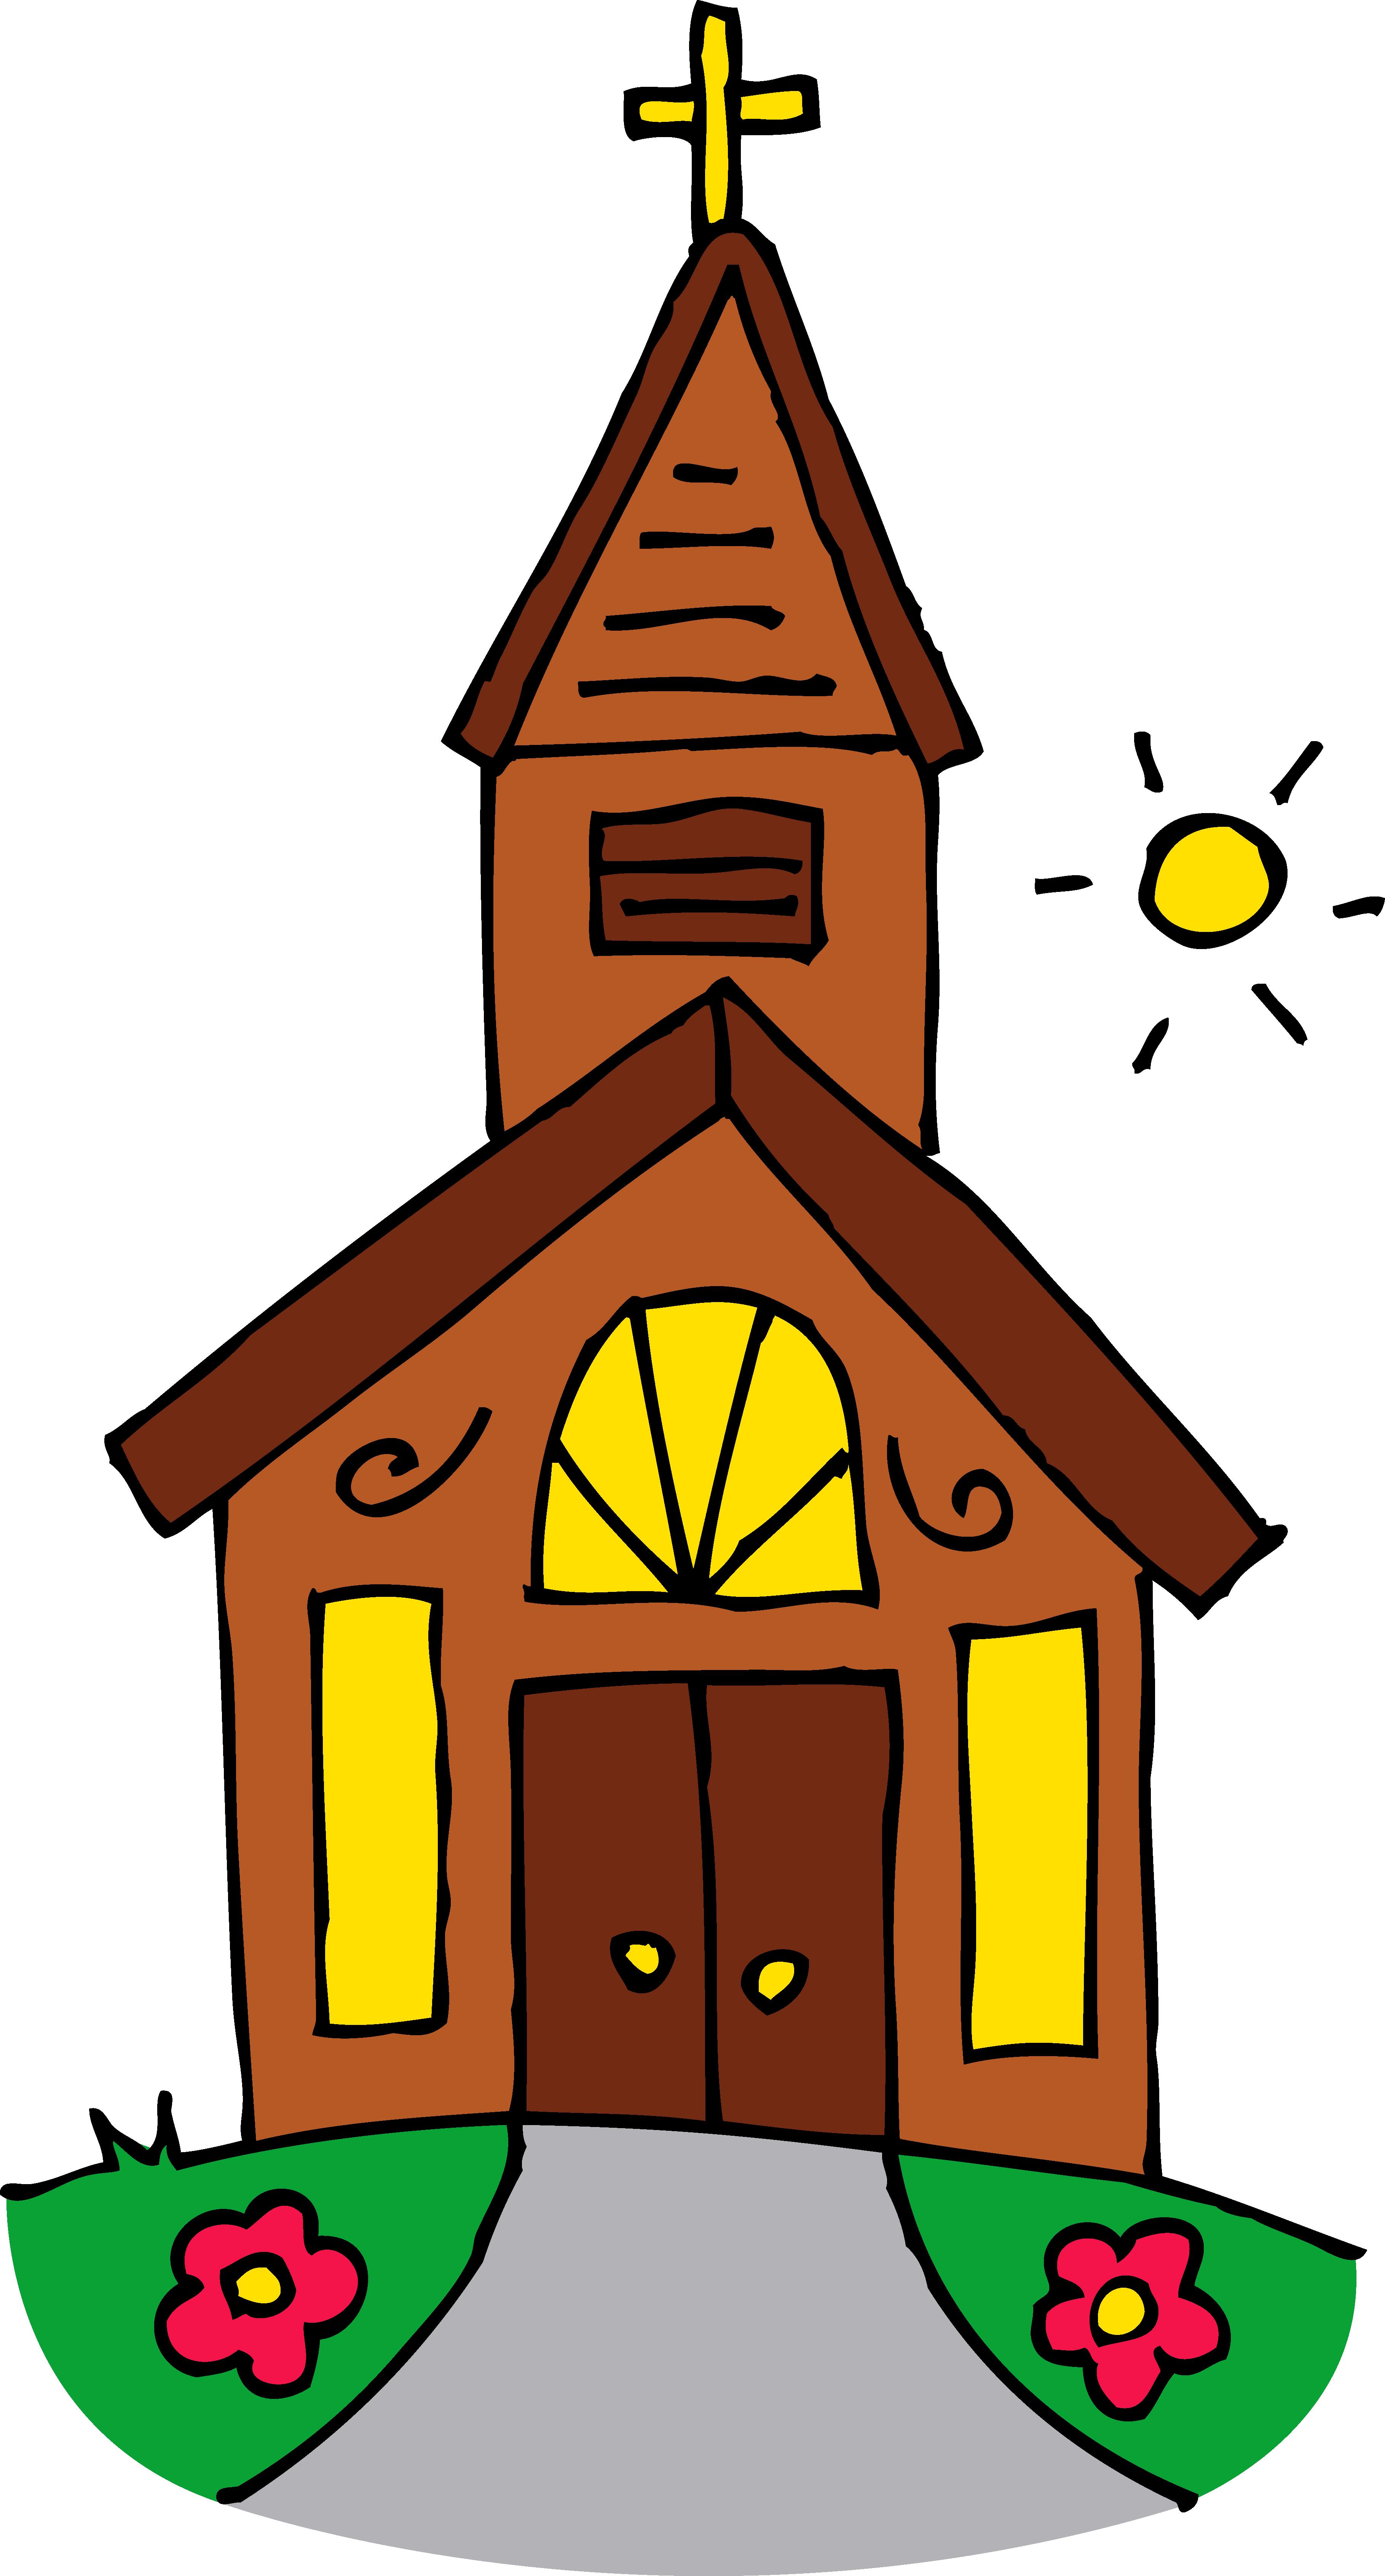 Church Clip Art - Blogsbeta-Church Clip Art - Blogsbeta-6